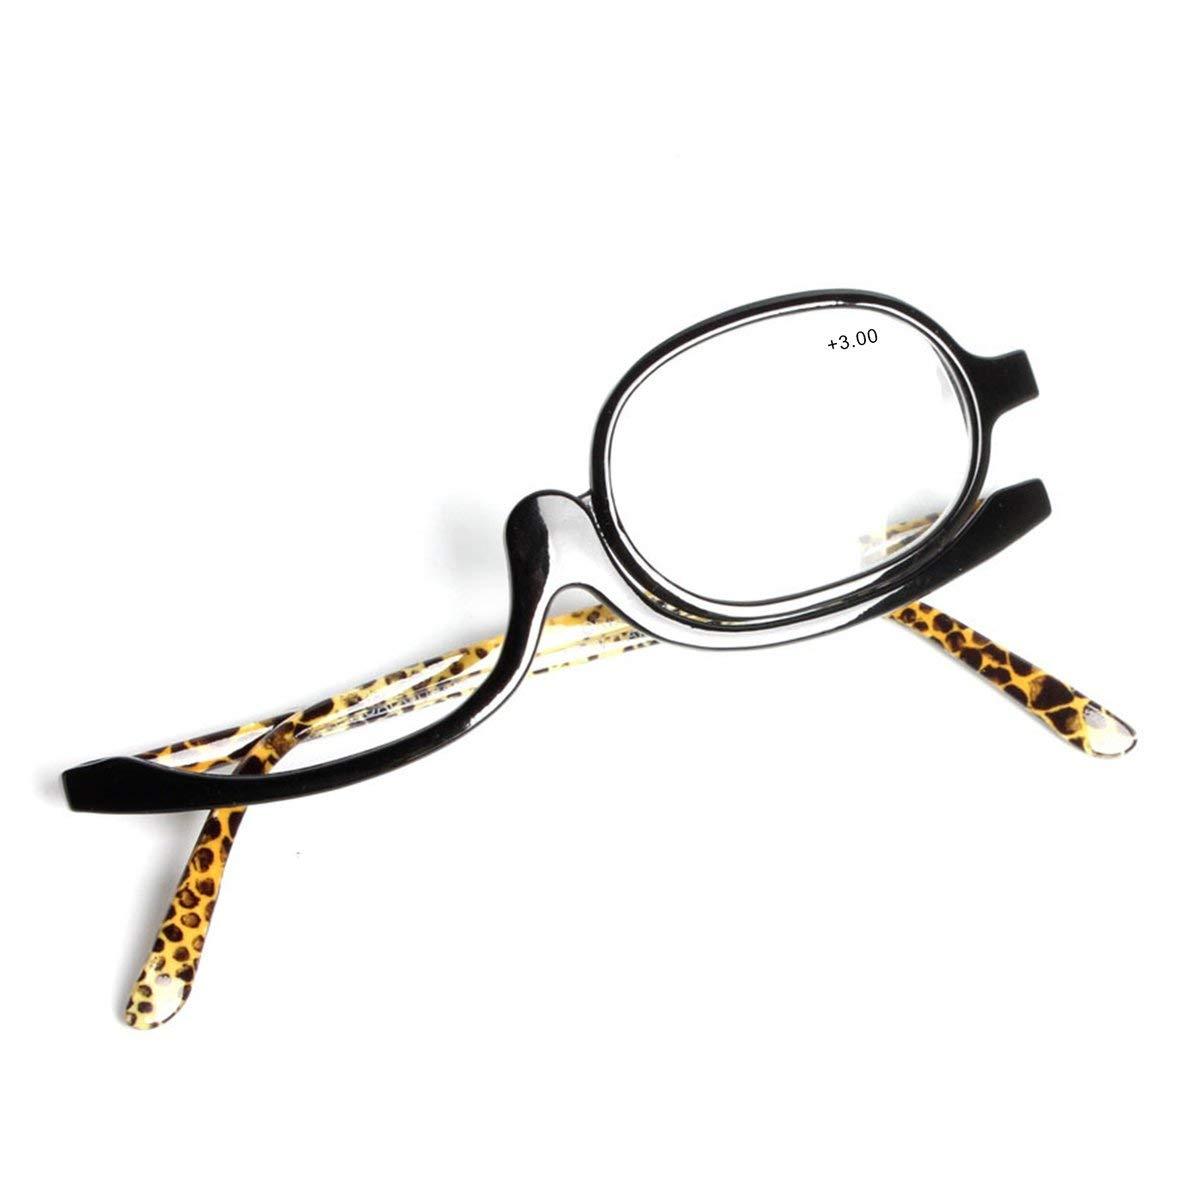 Noradtjcca Occhiali da Lettura Monoculari rotanti da 180 Gradi Occhiali da Lettura per Il Trucco Occhiali da Sole Portatili Singoli Lenes Femmine